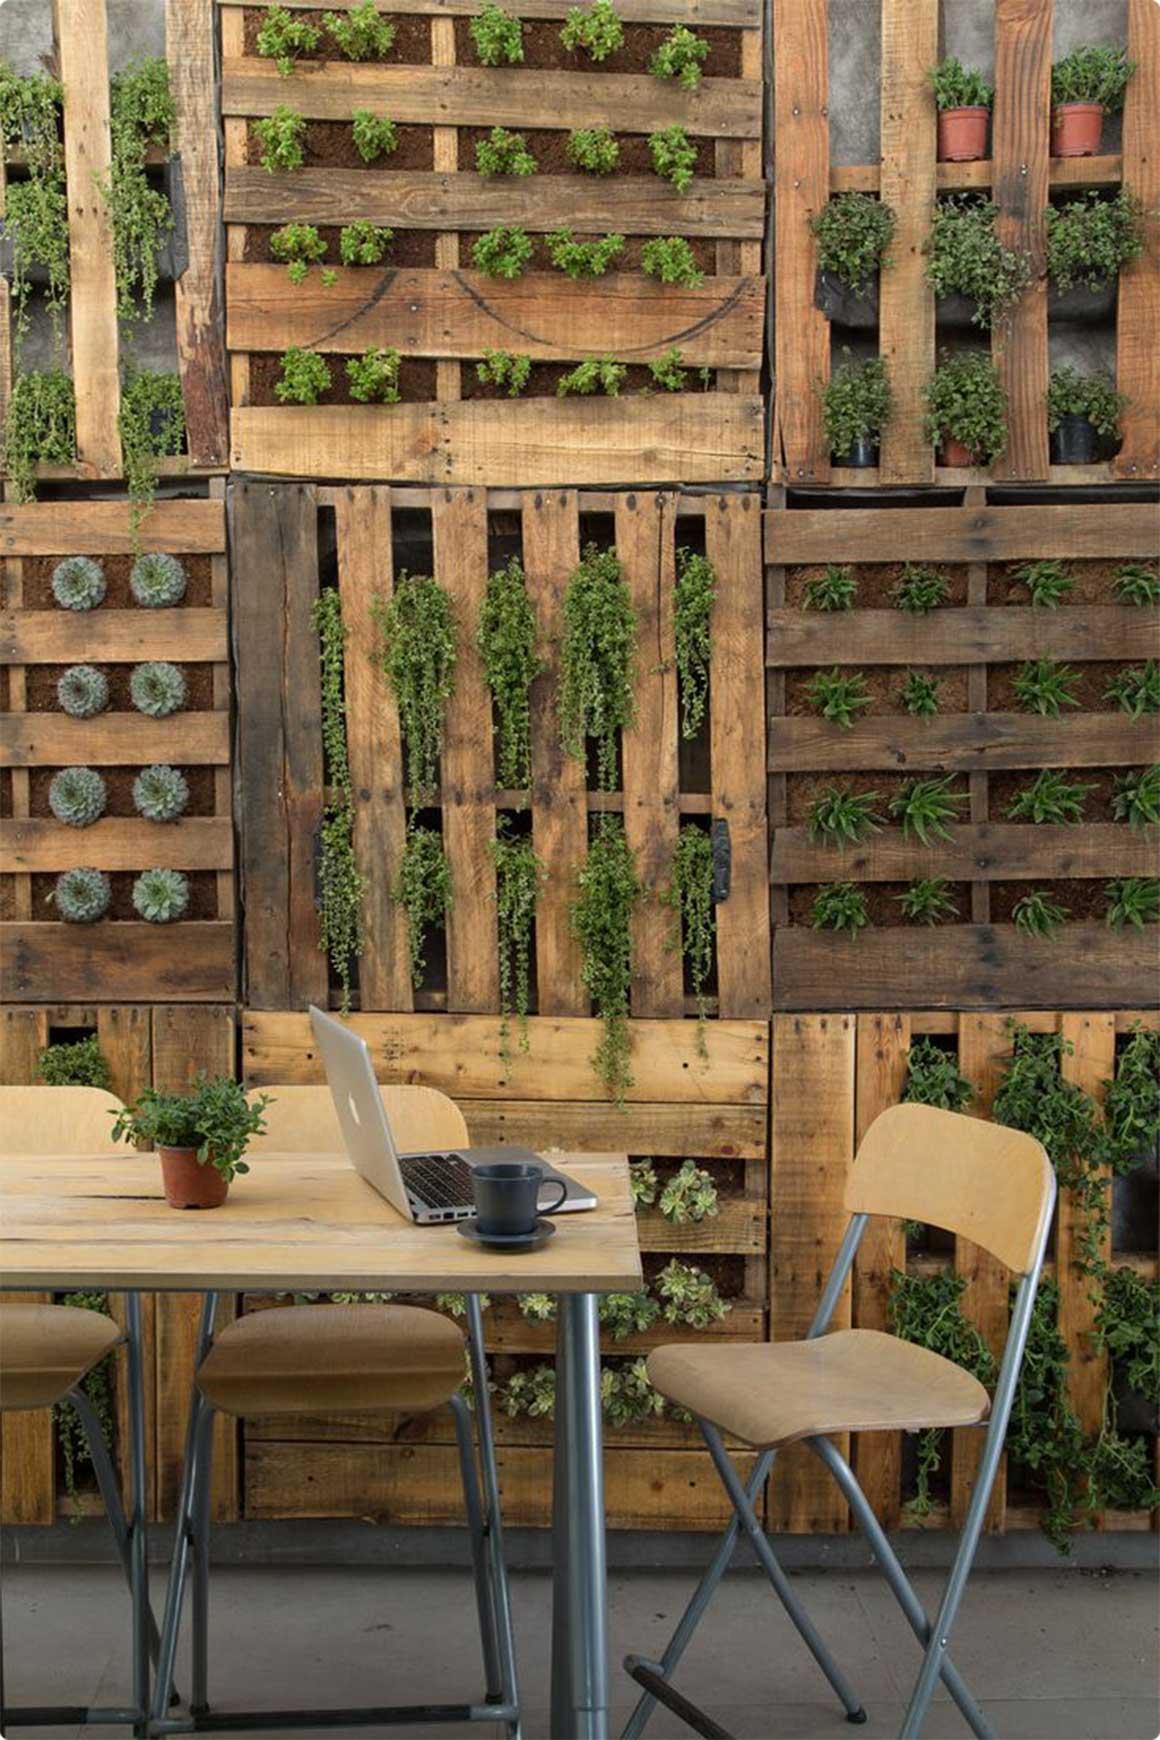 Gardening in small spaces – Your LOCAL Gardener